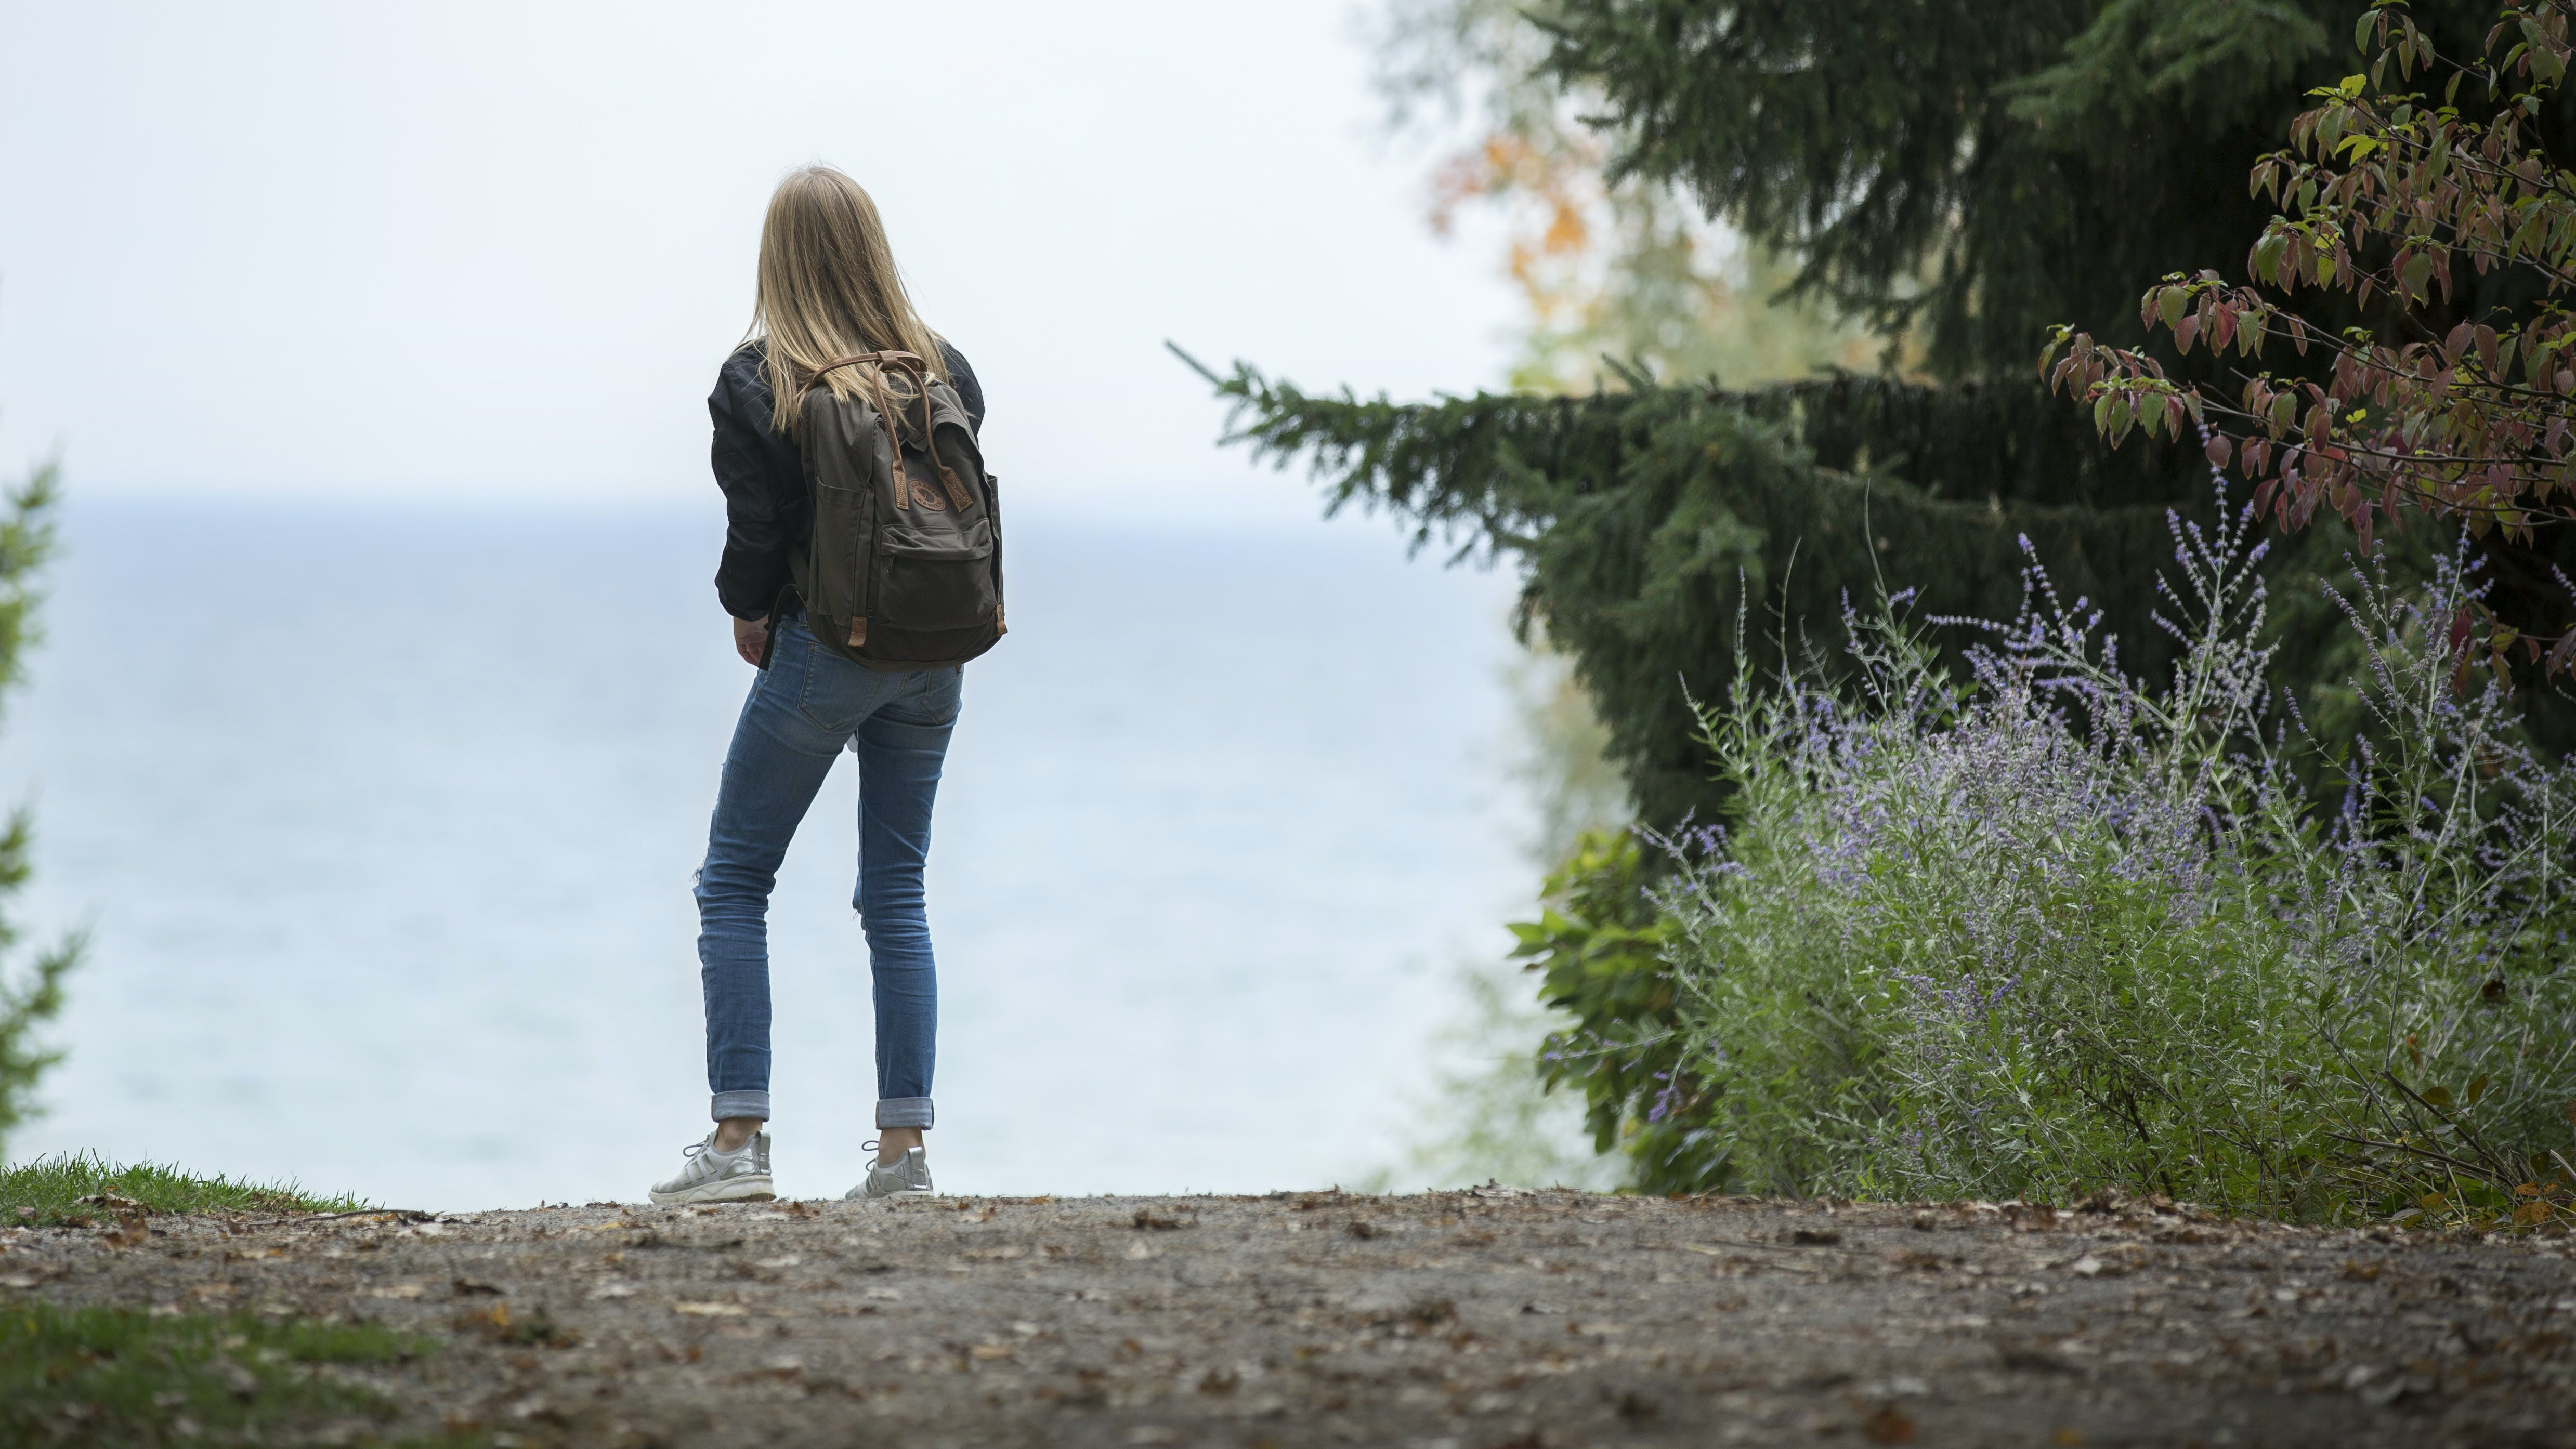 adventure, backpack, beach